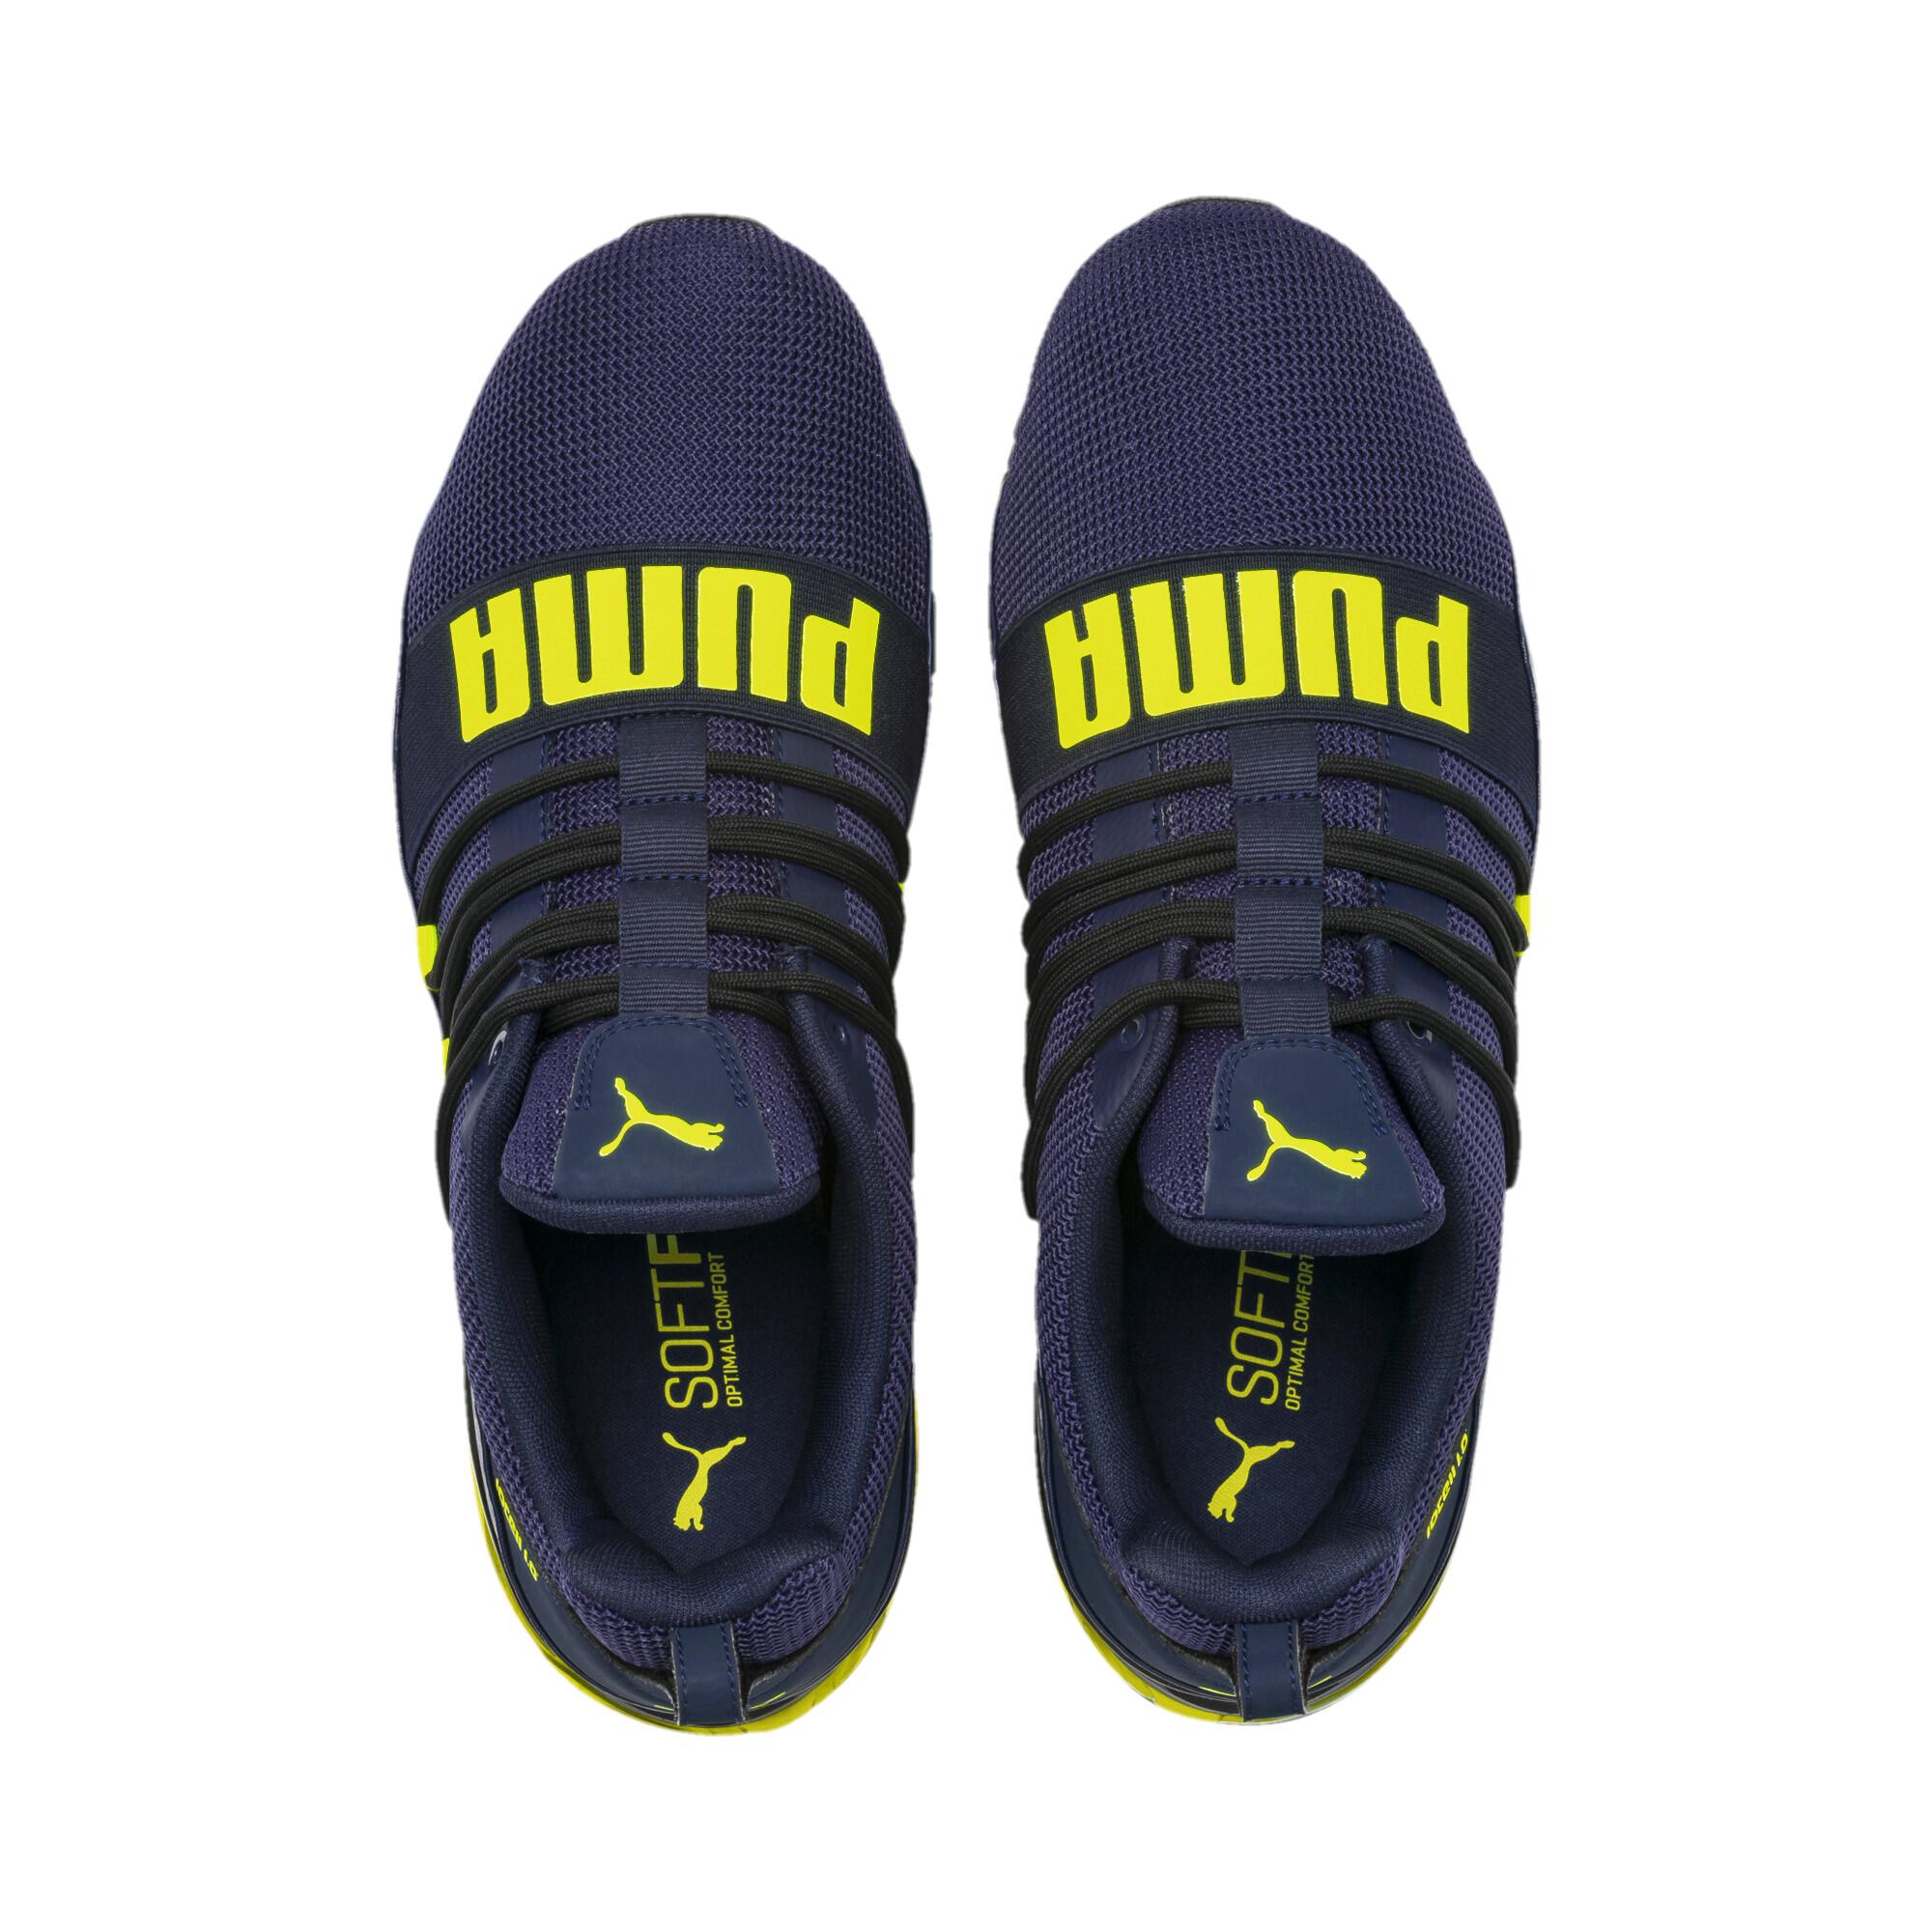 PUMA-CELL-Regulate-Camo-Men-s-Training-Shoes-Men-Shoe-Running thumbnail 15